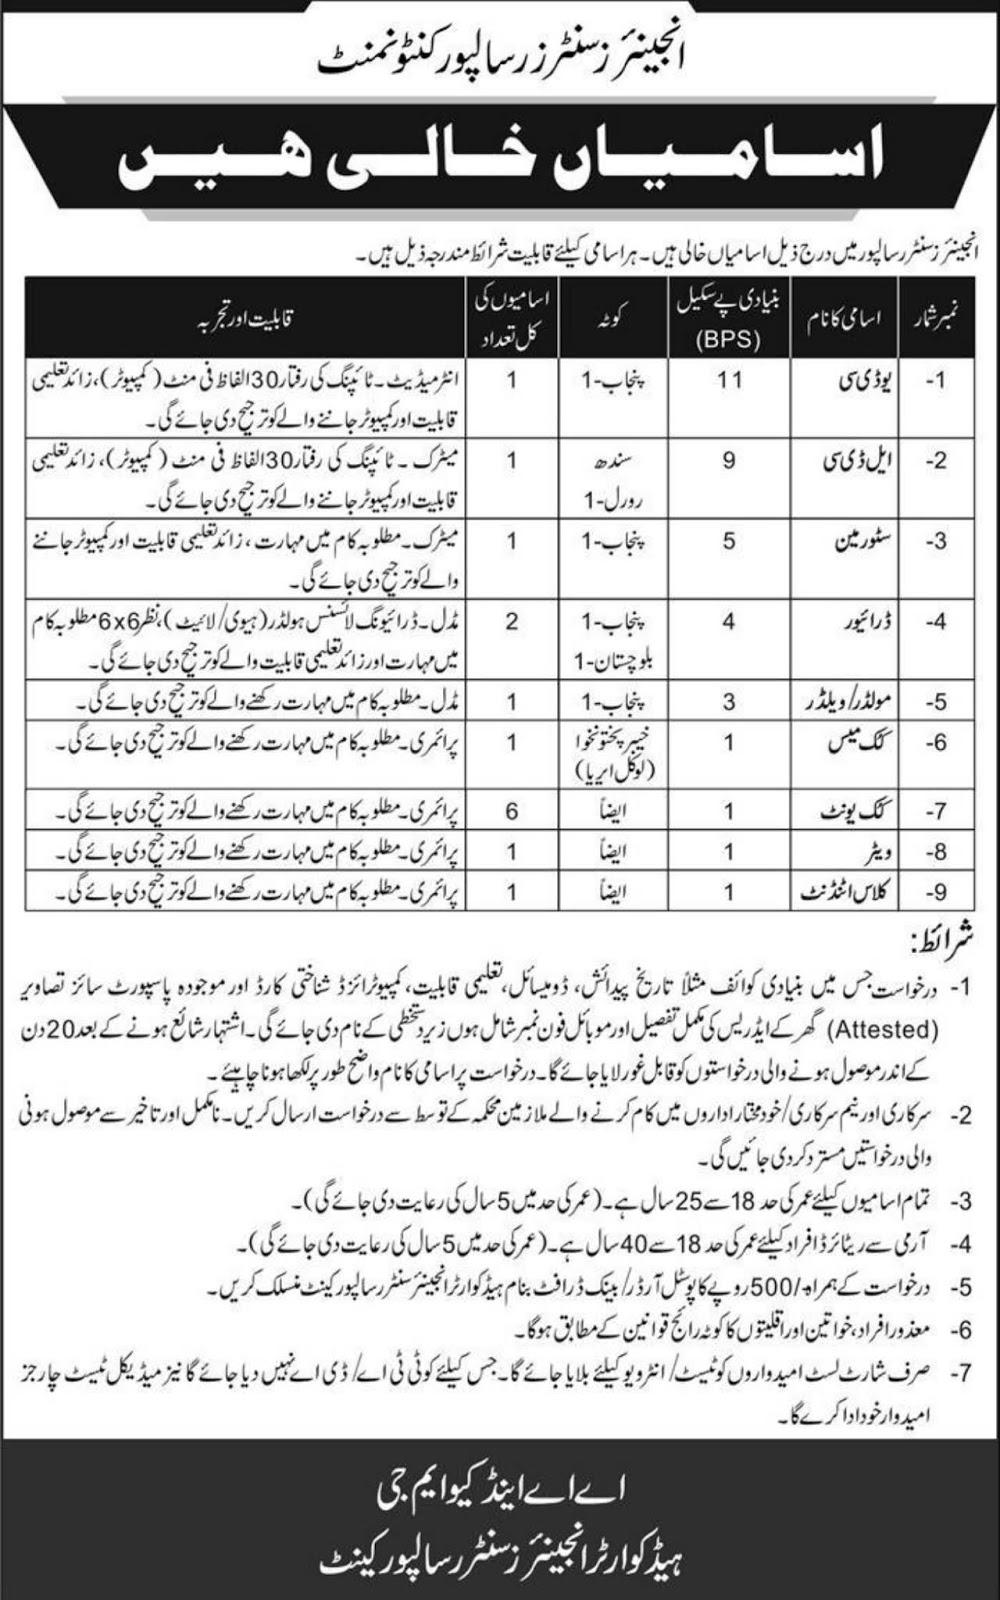 Engineers Center Risalpur Cantt Jobs 2019 Pak Army